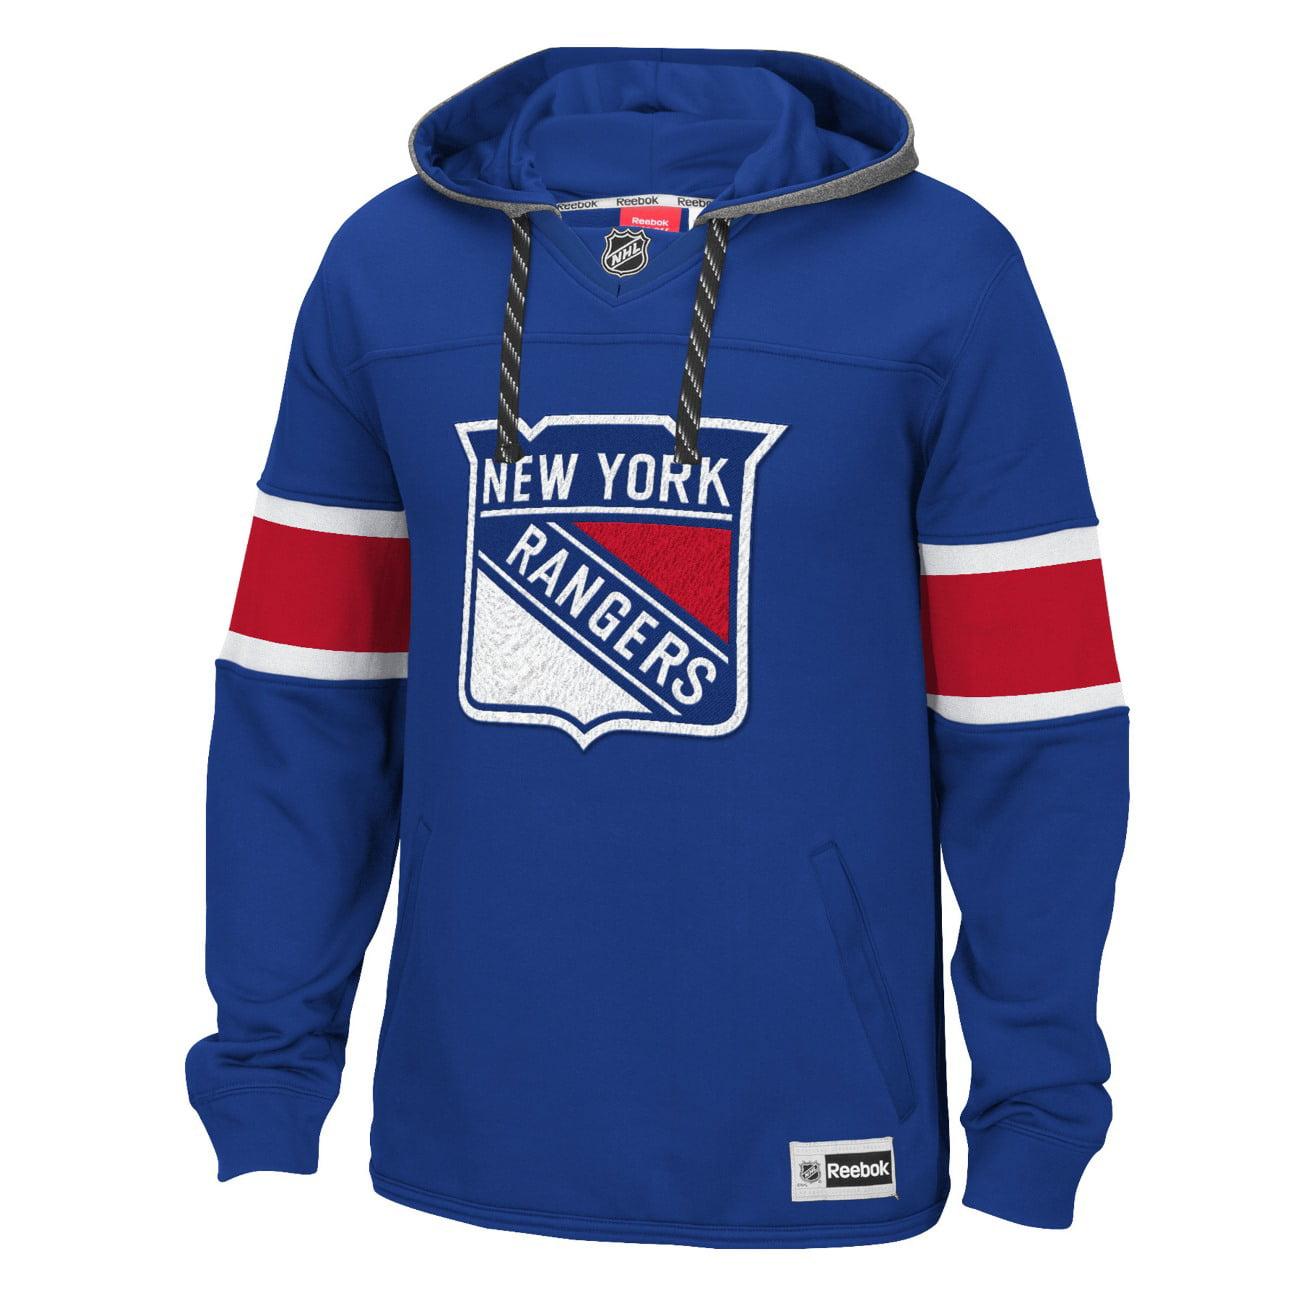 "New York Rangers Reebok NHL Men's ""Jersey"" Pullover Hooded Sweatshirt by REEBOK/SPORTS LICENSED DIVISION"